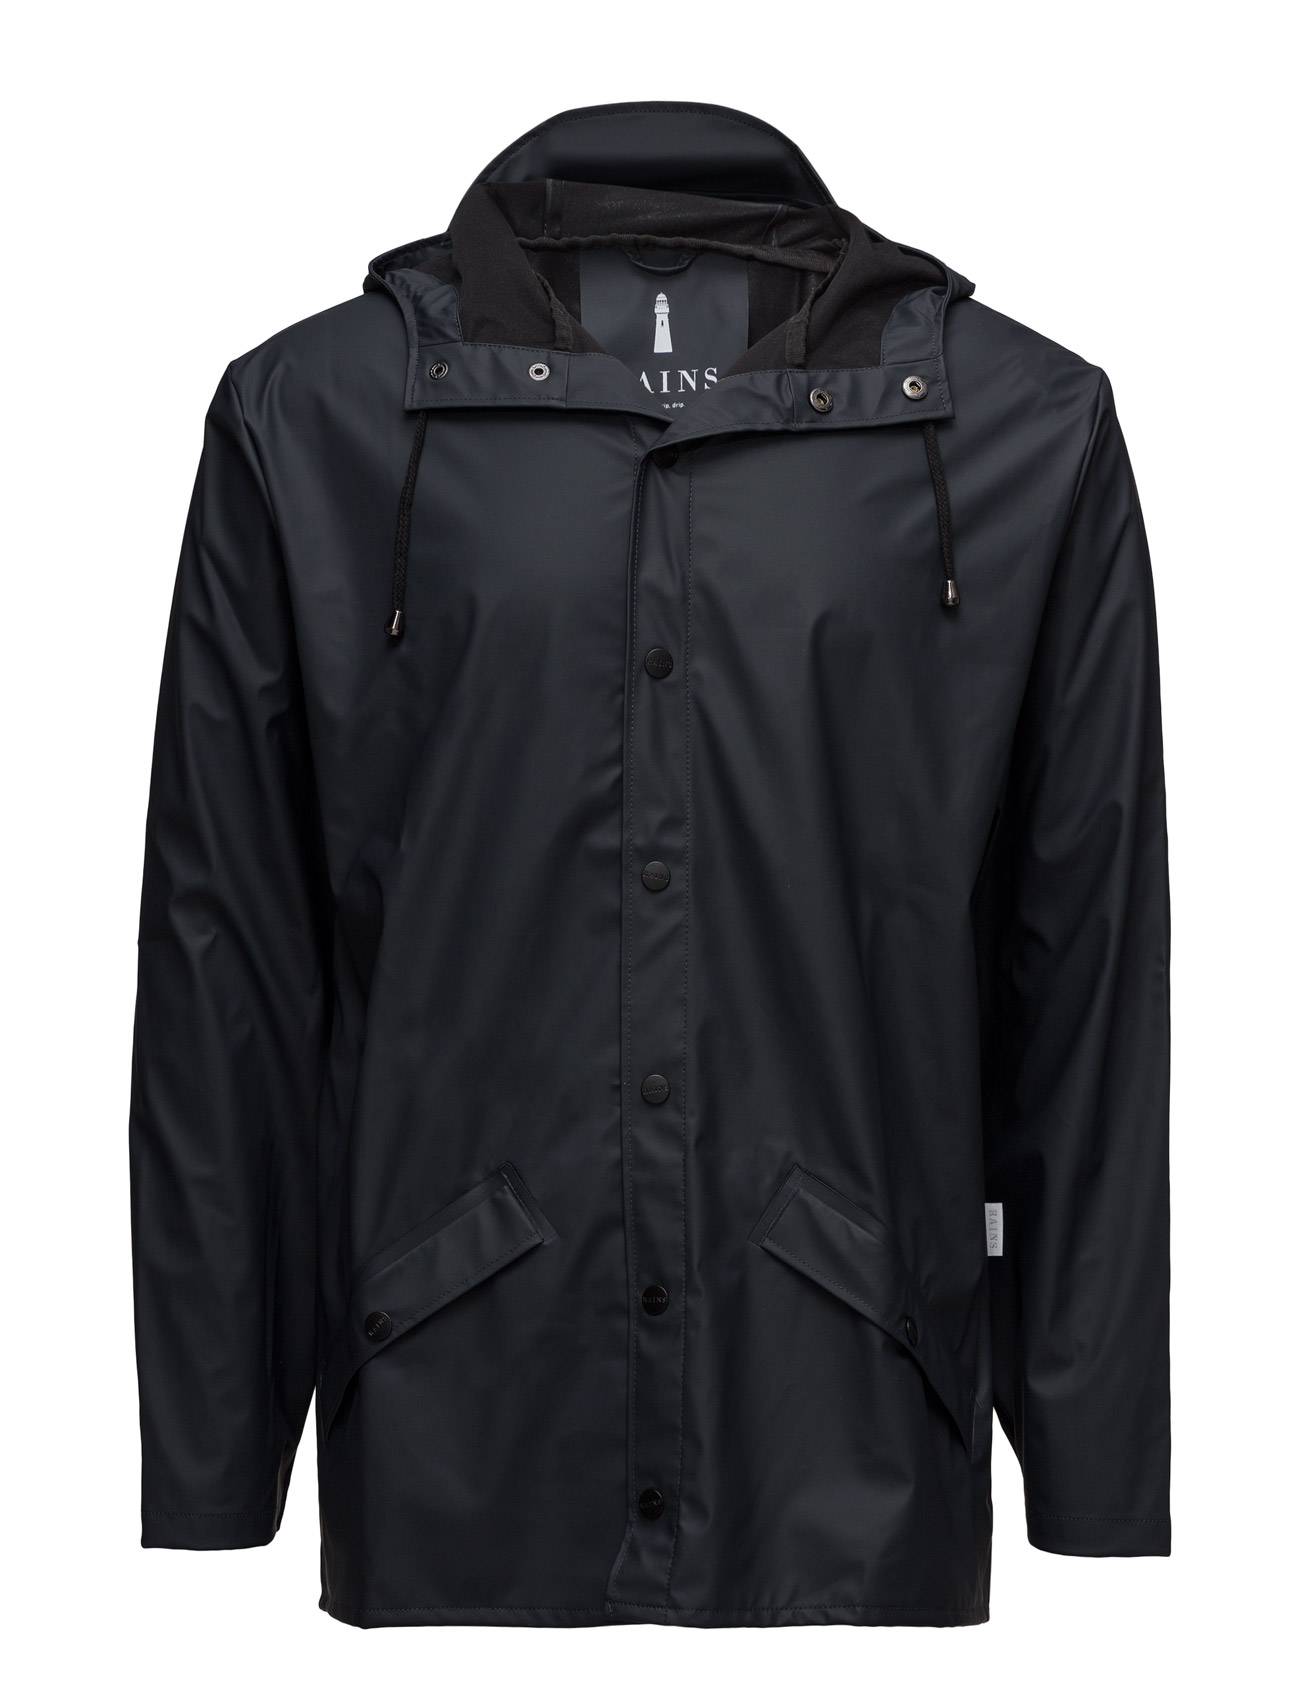 Jacket fra rains på boozt.com dk